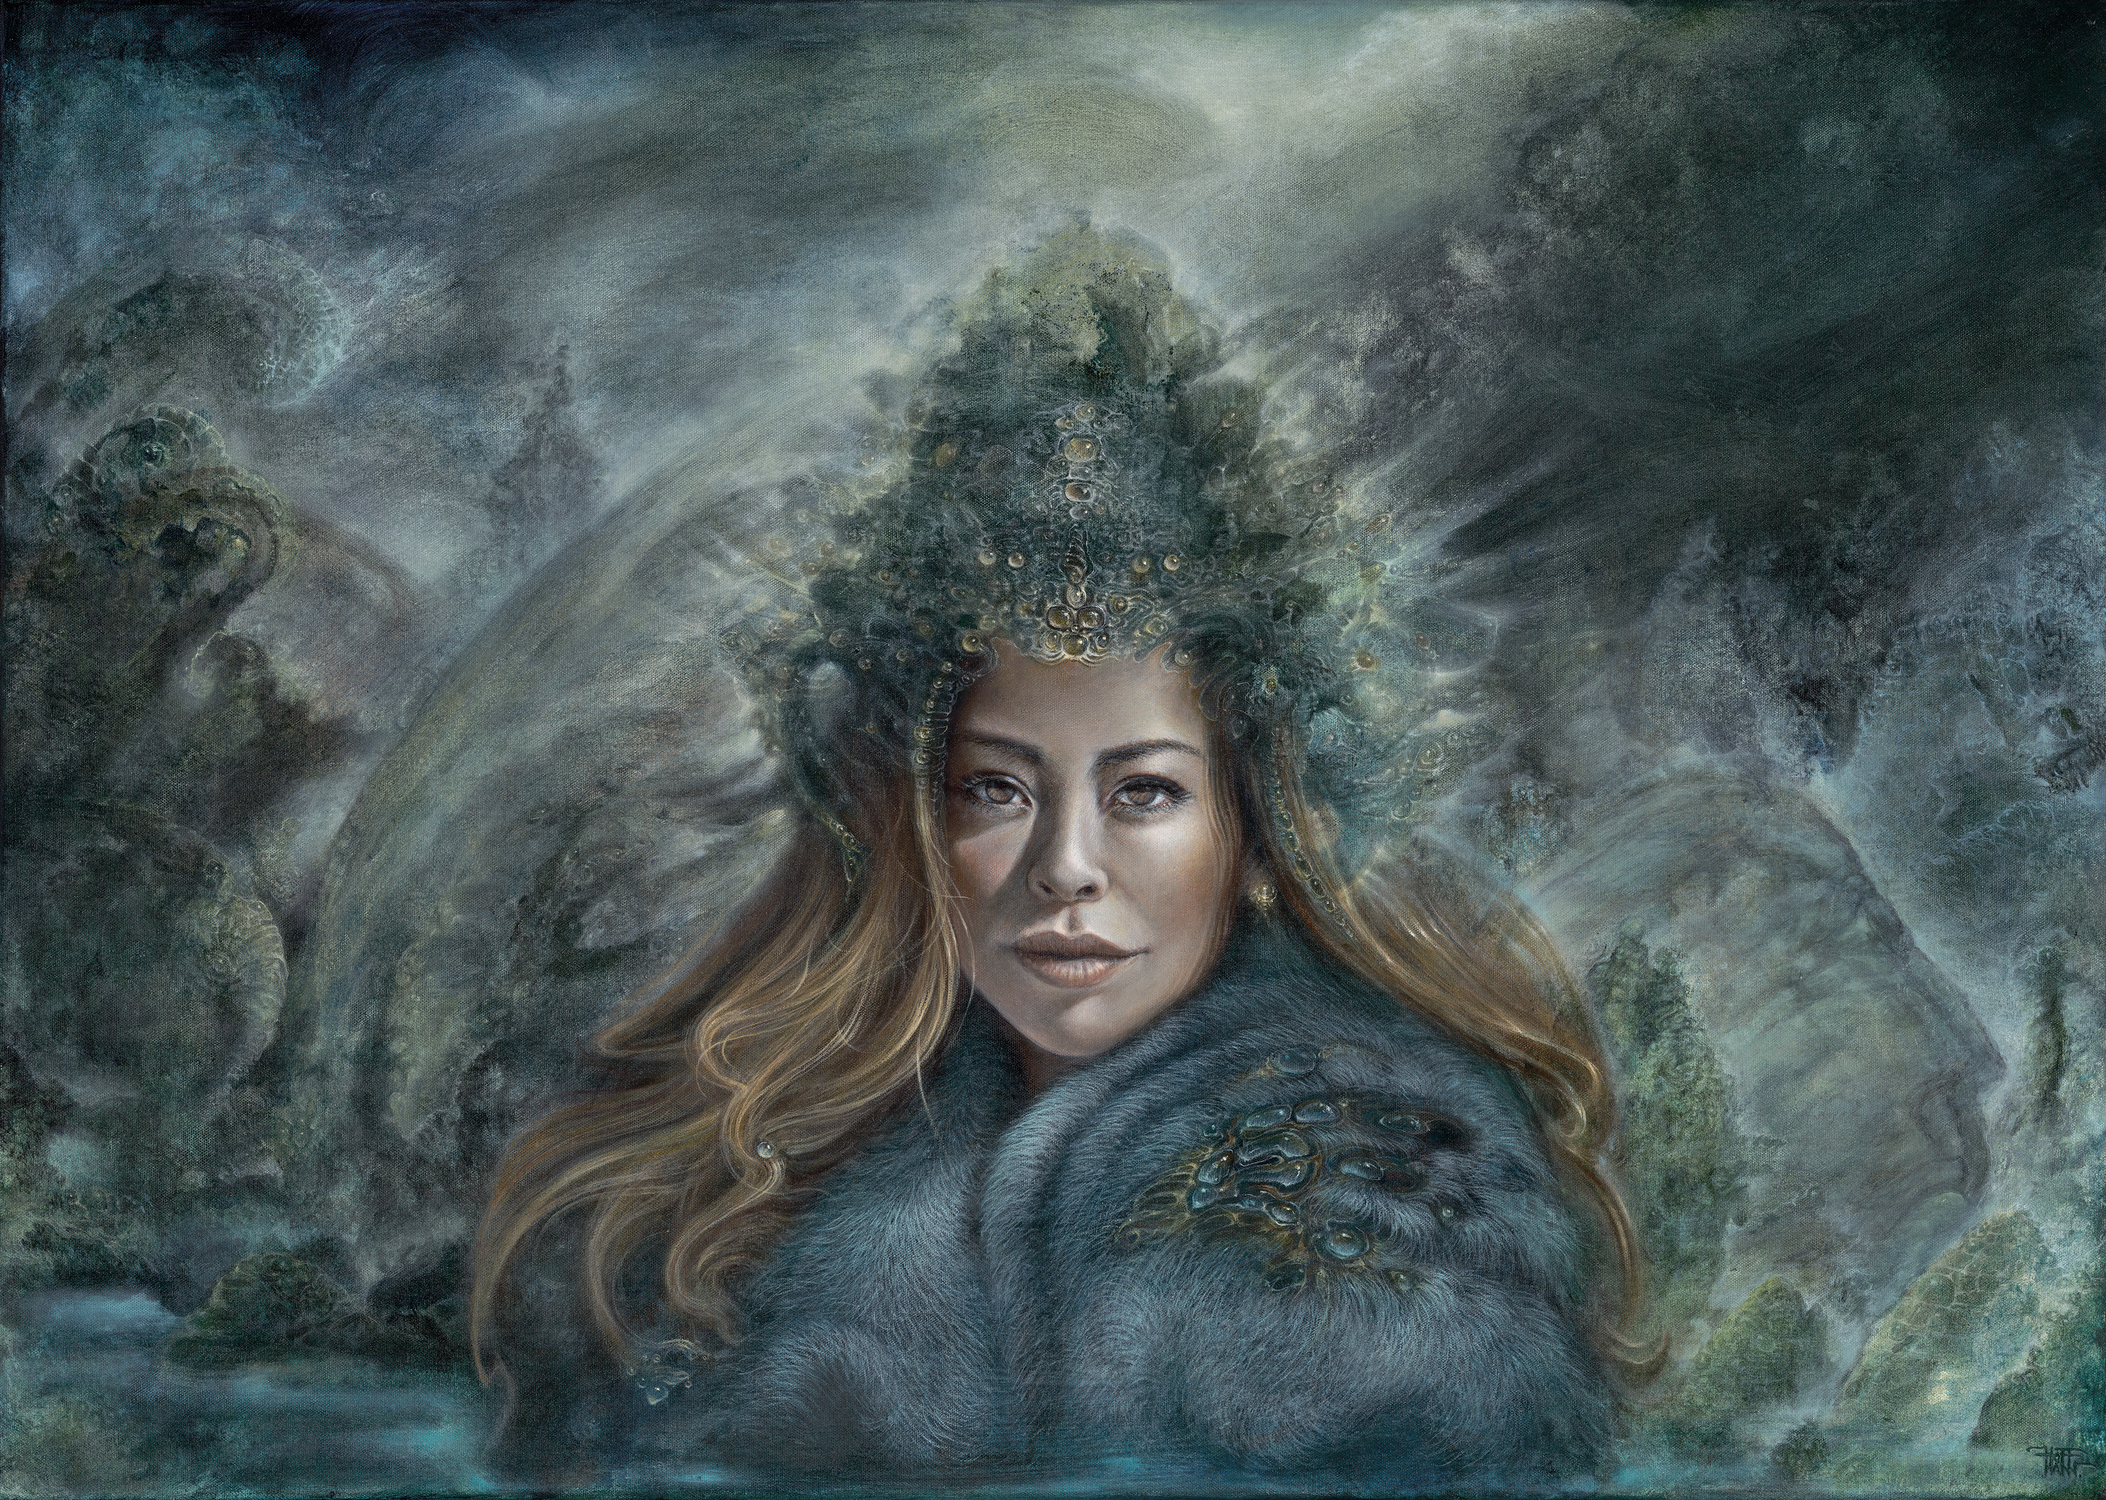 TRANG LE (KHATUN) Artwork by Martina Hoffmann